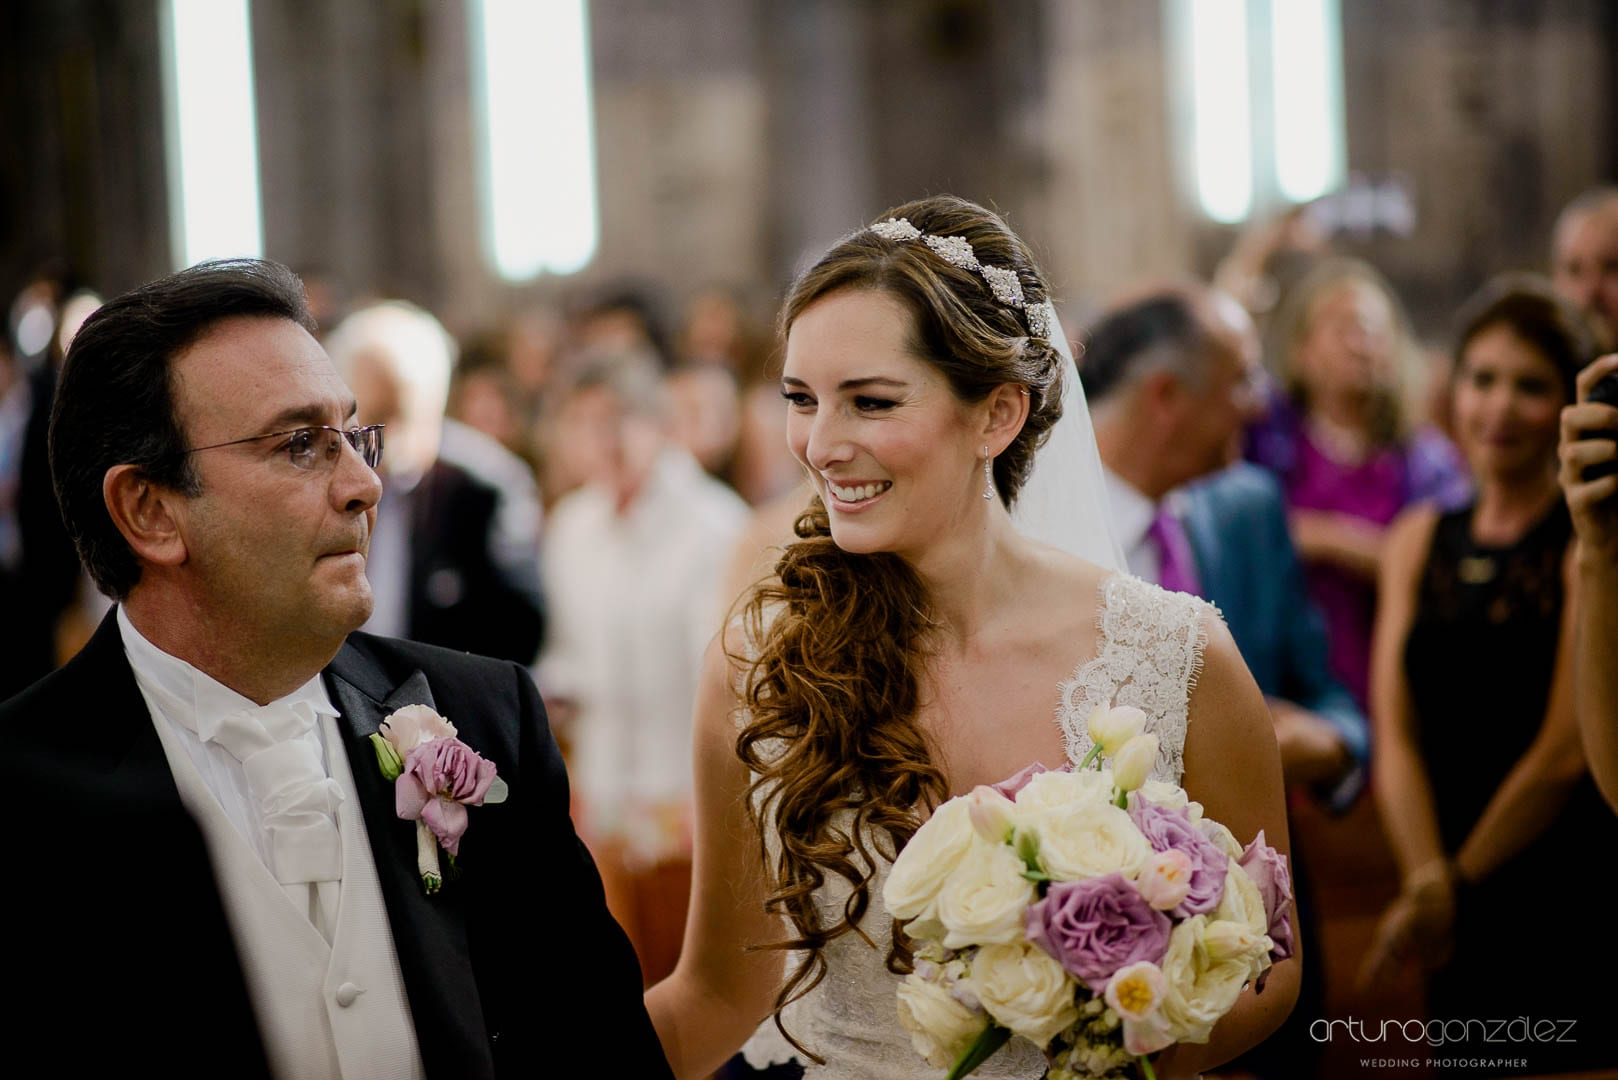 fotografo-de-bodas-en-guanajuato-65